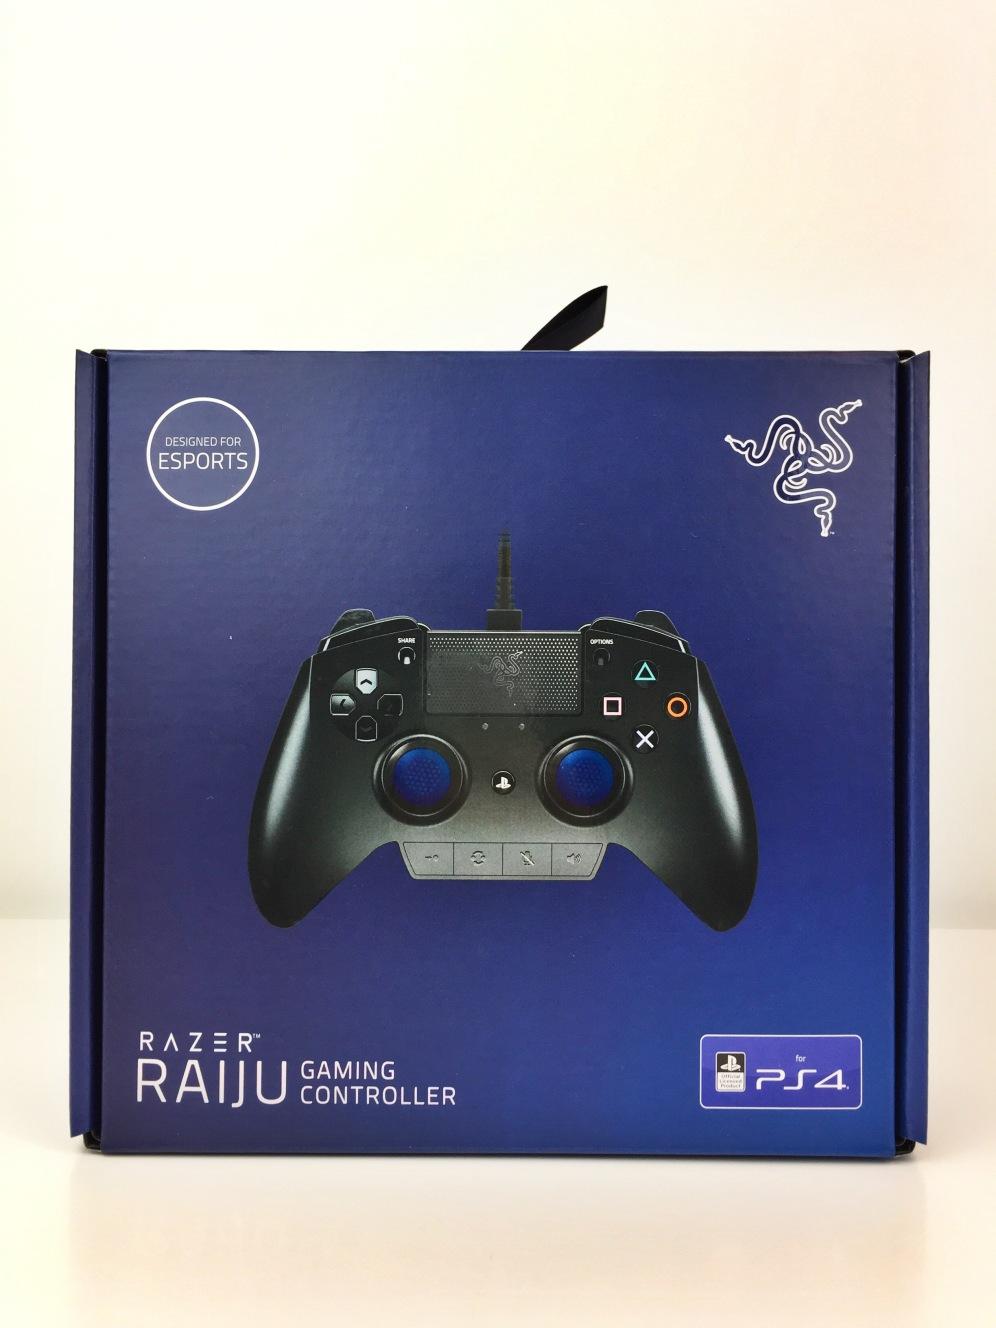 Razer Raiju Gaming Controller for PS4